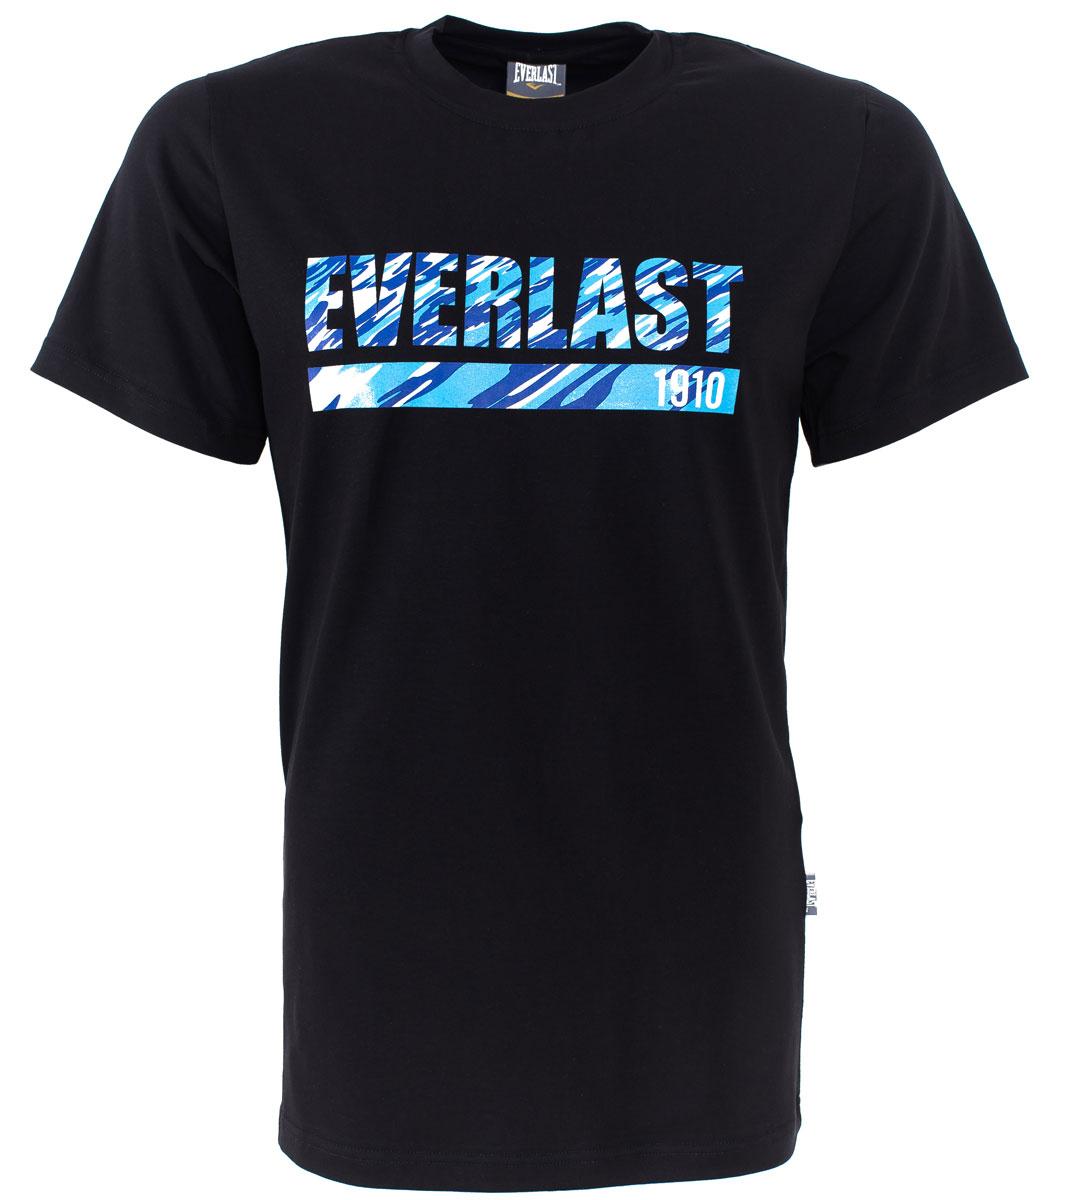 Футболка мужская Everlast Camouflage, цвет: черный. RE0032. Размер XXL (54/56) футболка мужская mitre цвет желтый tt29019 размер xxl 54 56